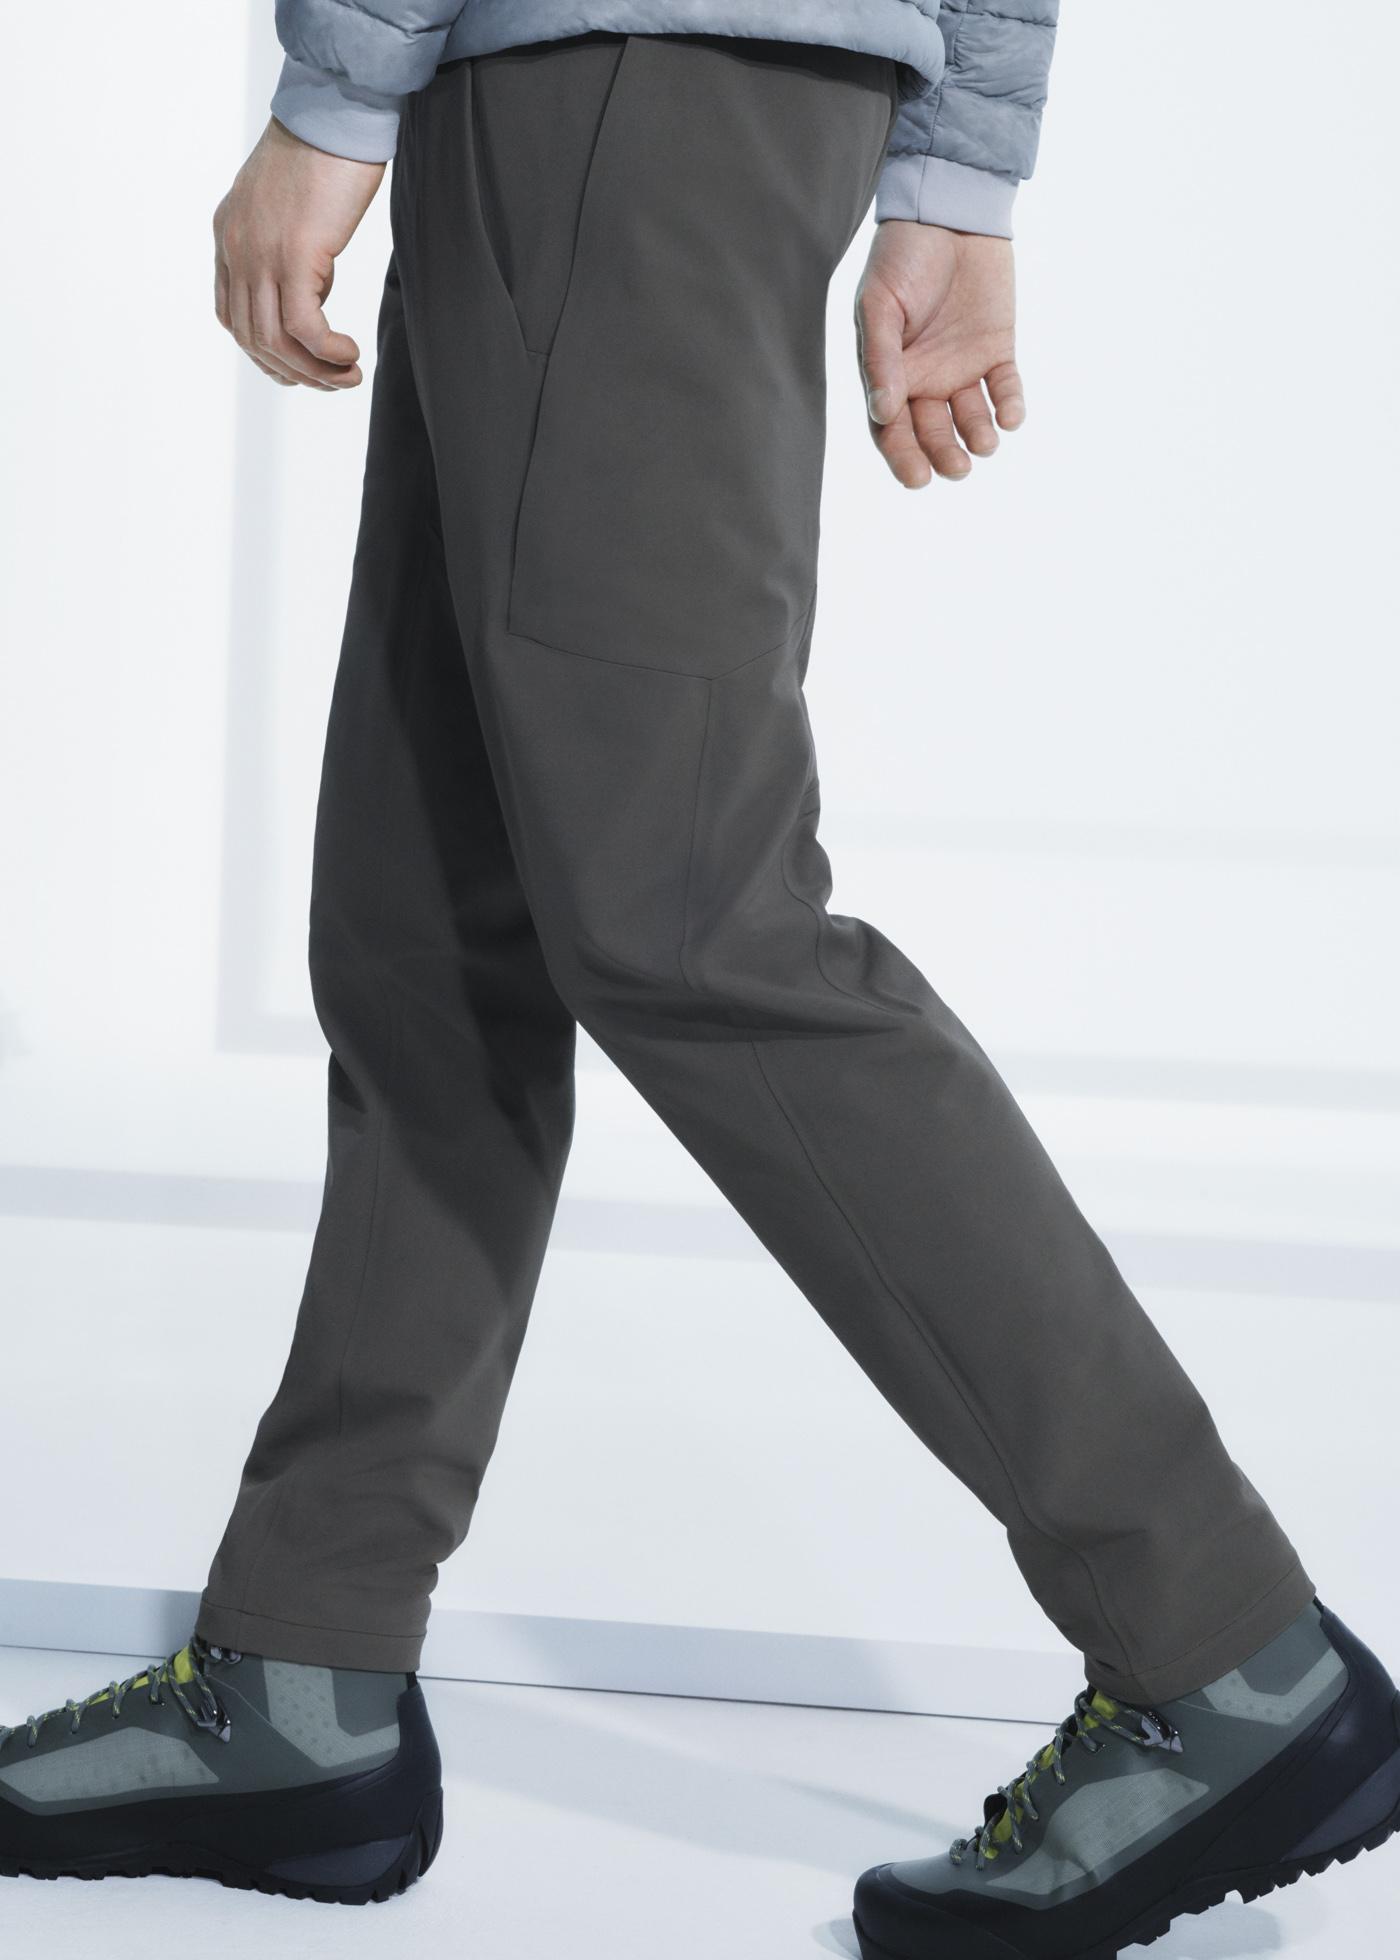 pants-f18.jpg?auto=format